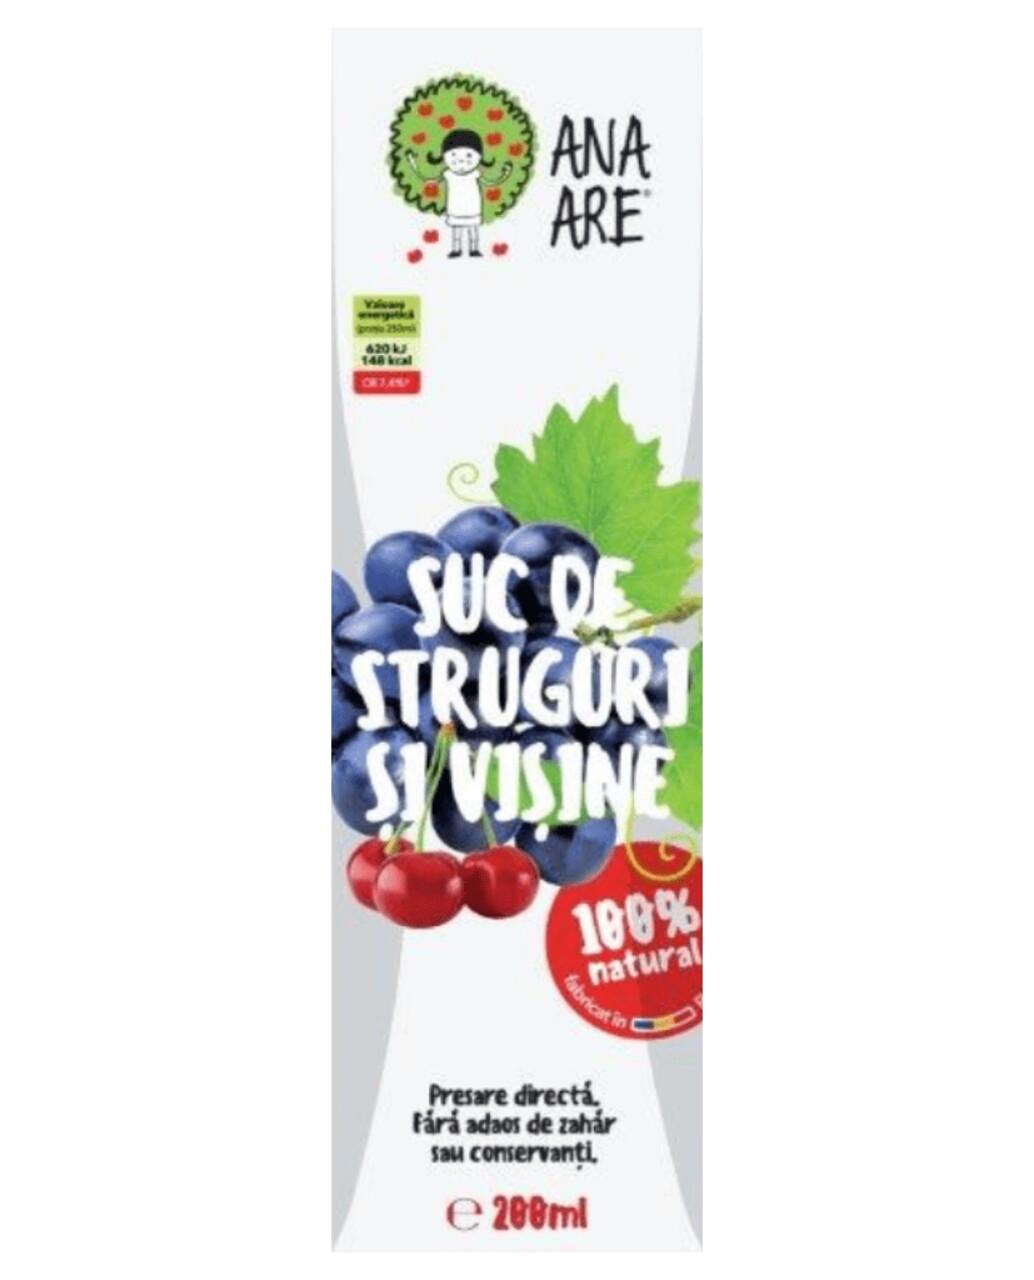 Suc de Struguri & Visine 100% Natural Ana Are 24X 0.2L